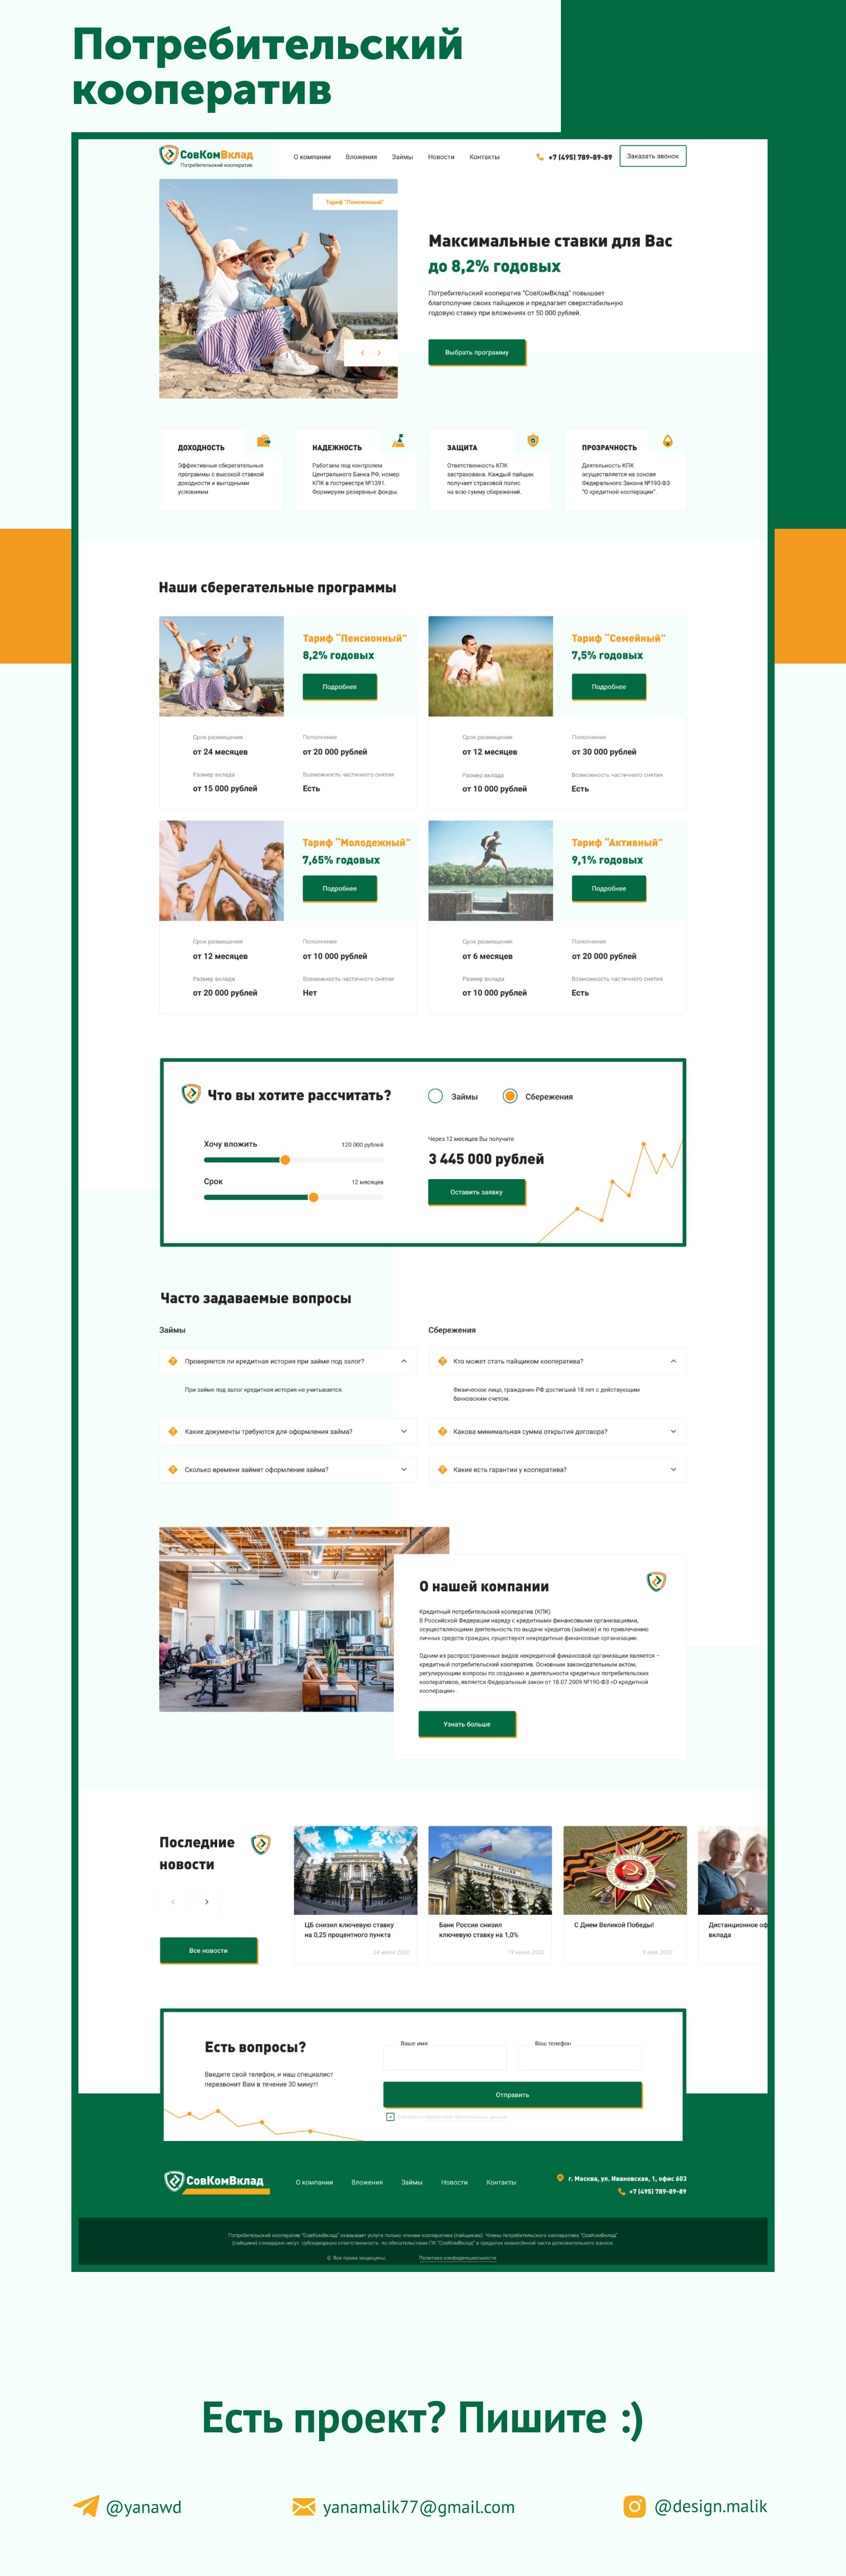 Сайт для потребительского кооператива